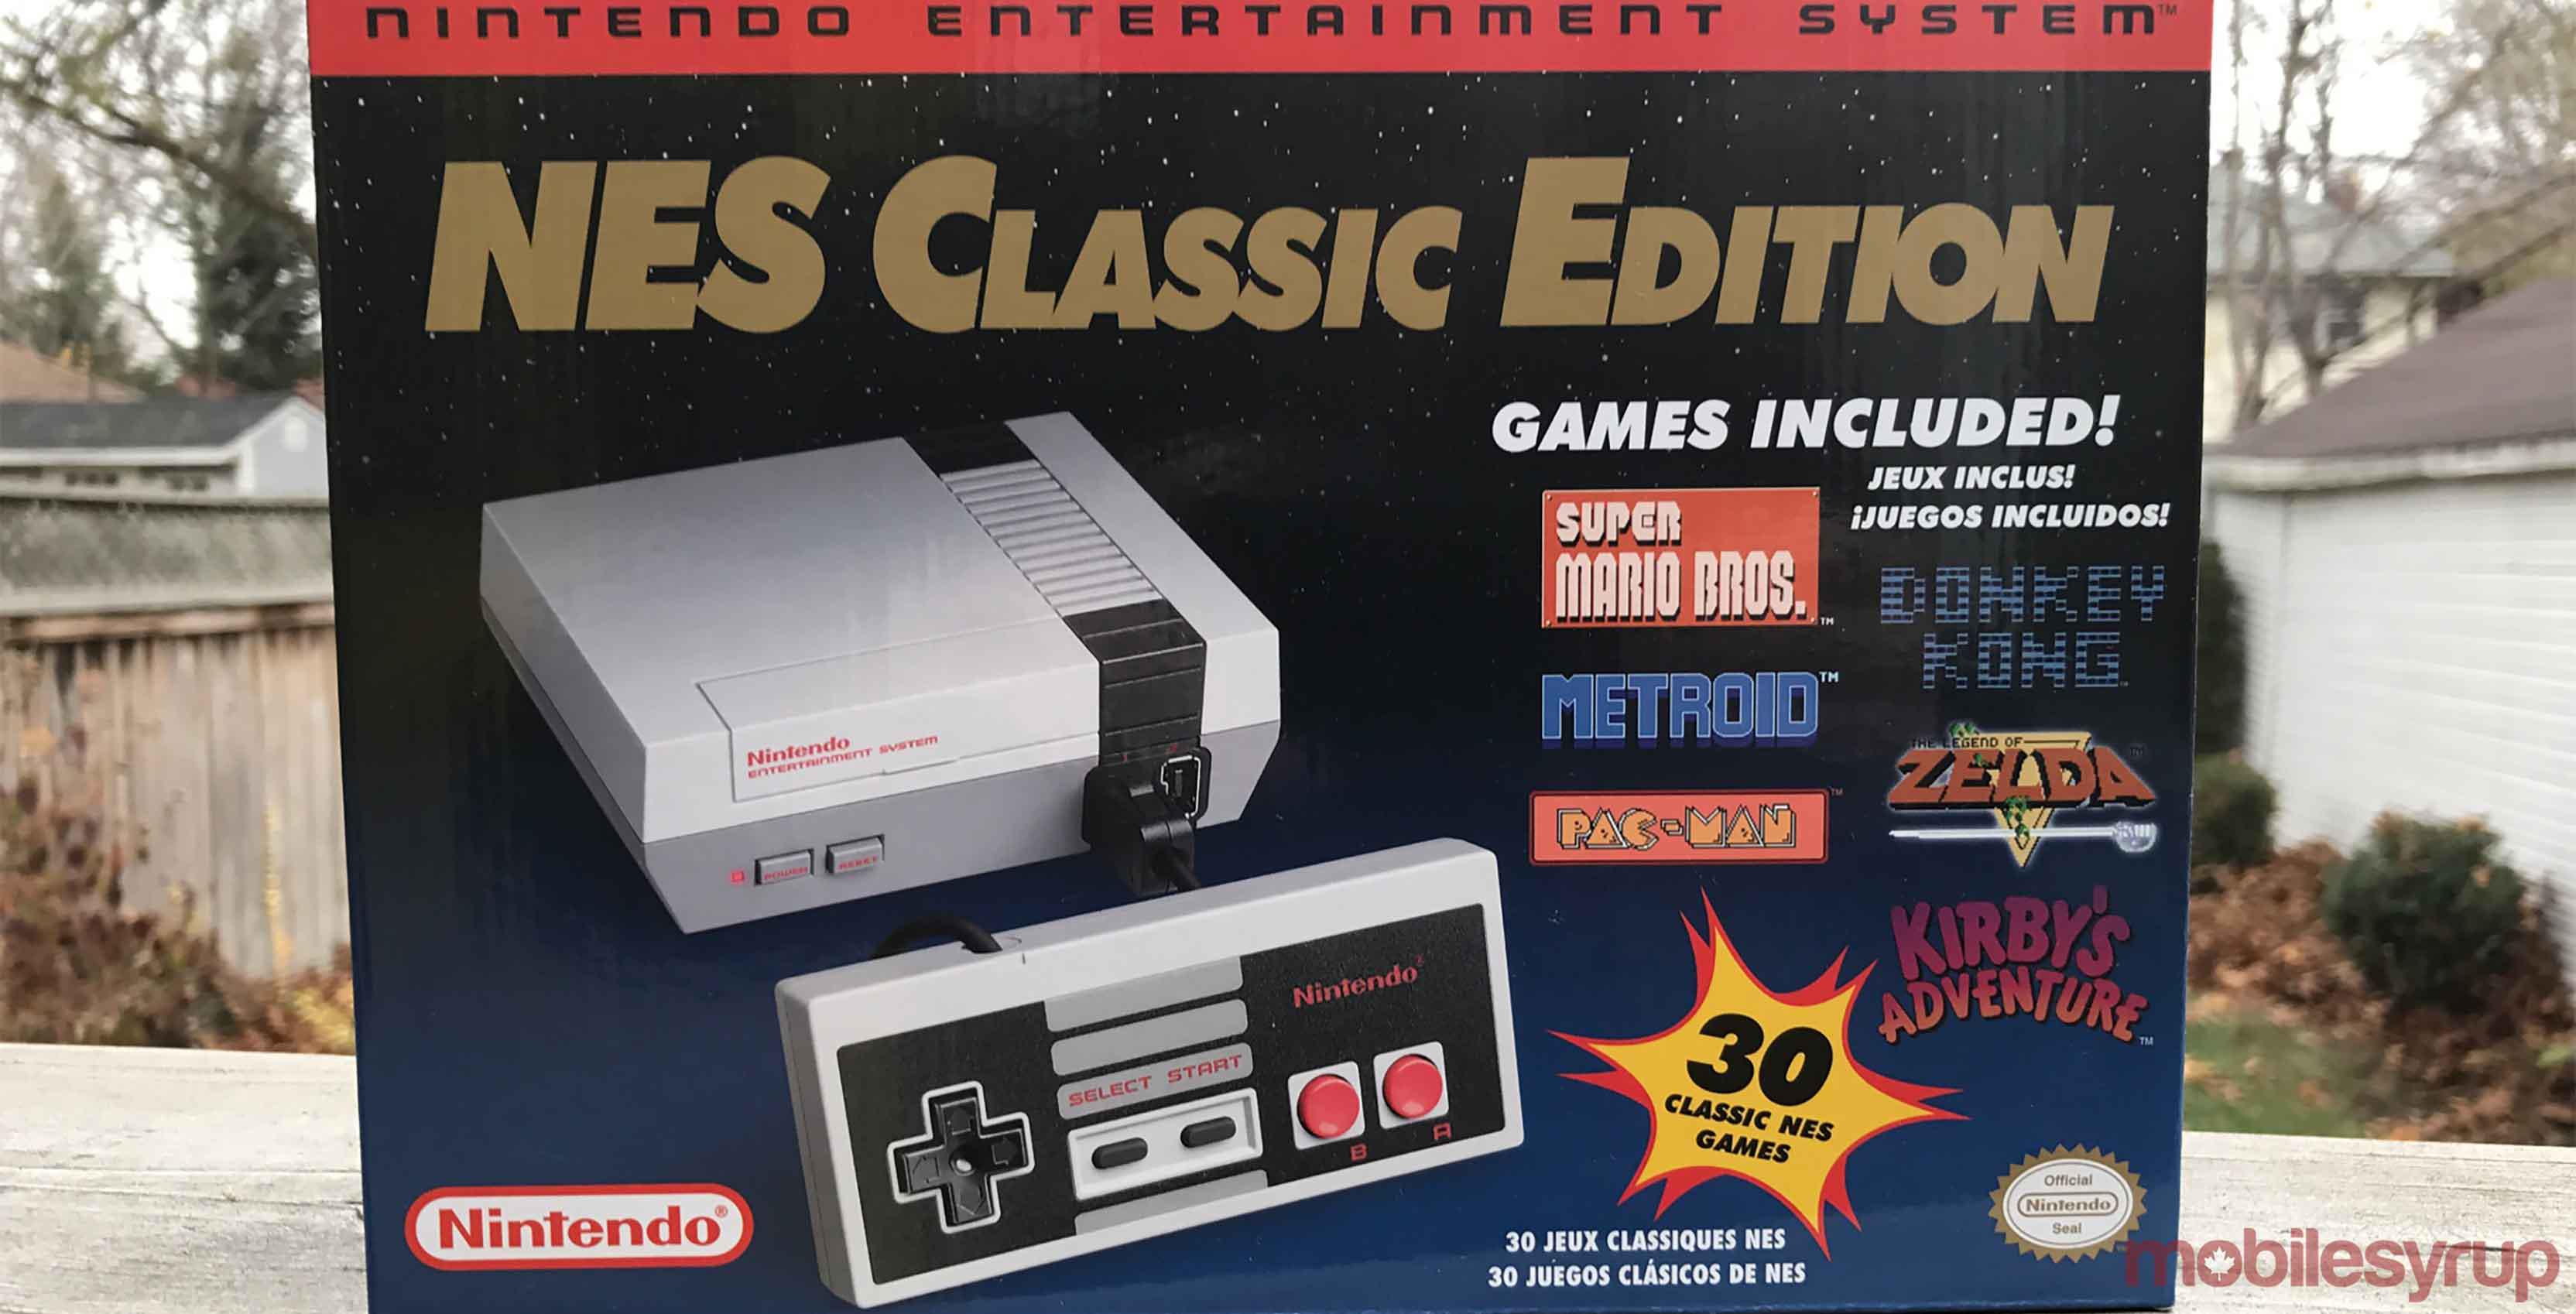 Nintendo S Nes Classic Is Back In Stock On Amazon Canada